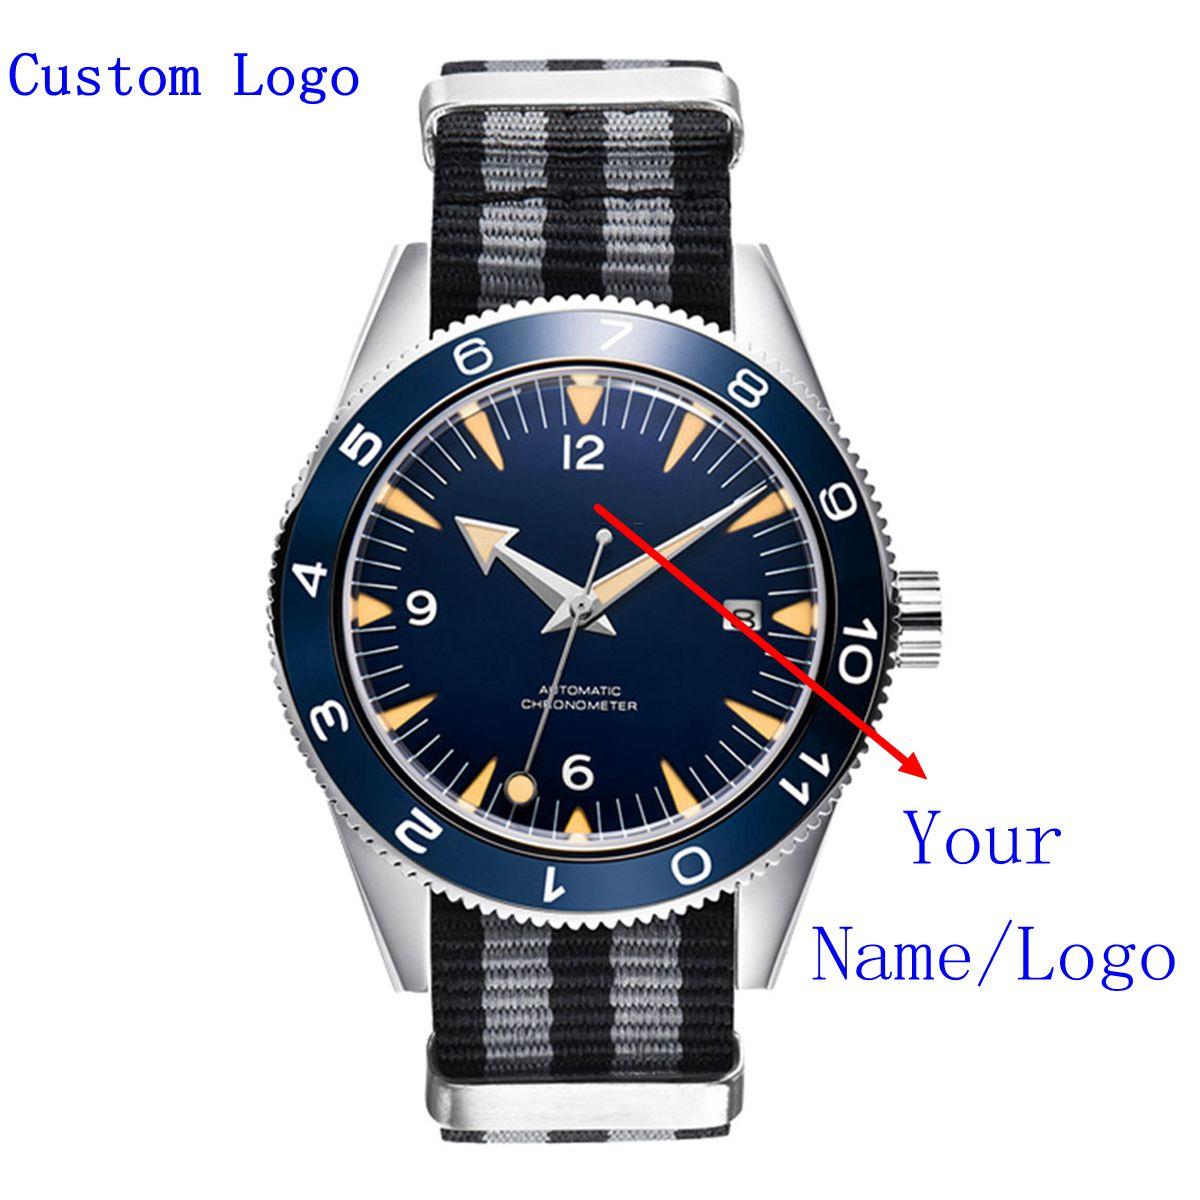 NH35 التلقائي الفاخرة العلامة التجارية العسكرية الرجال ساعة الياقوت الكريستال مضيئة الرياضة الذكور ساعة التقويم 10Bar ساعة اليد الميكانيكية